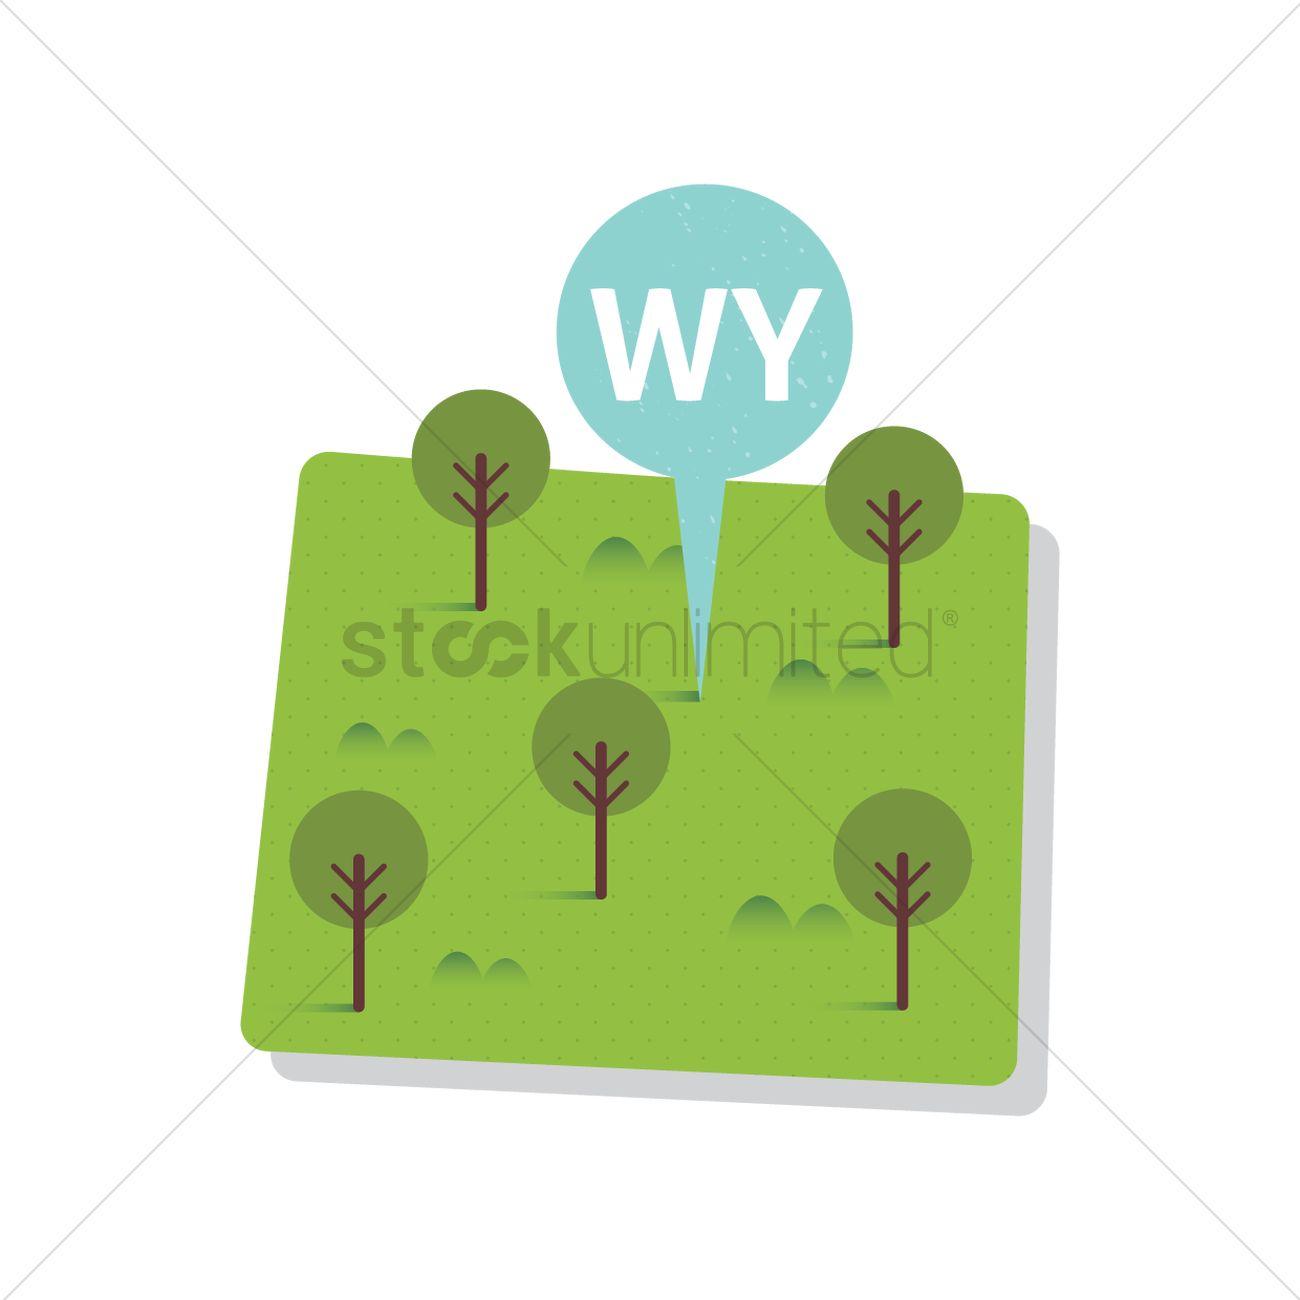 Free Wyoming State Map.Free Wyoming State Map Vector Image 1557093 Stockunlimited